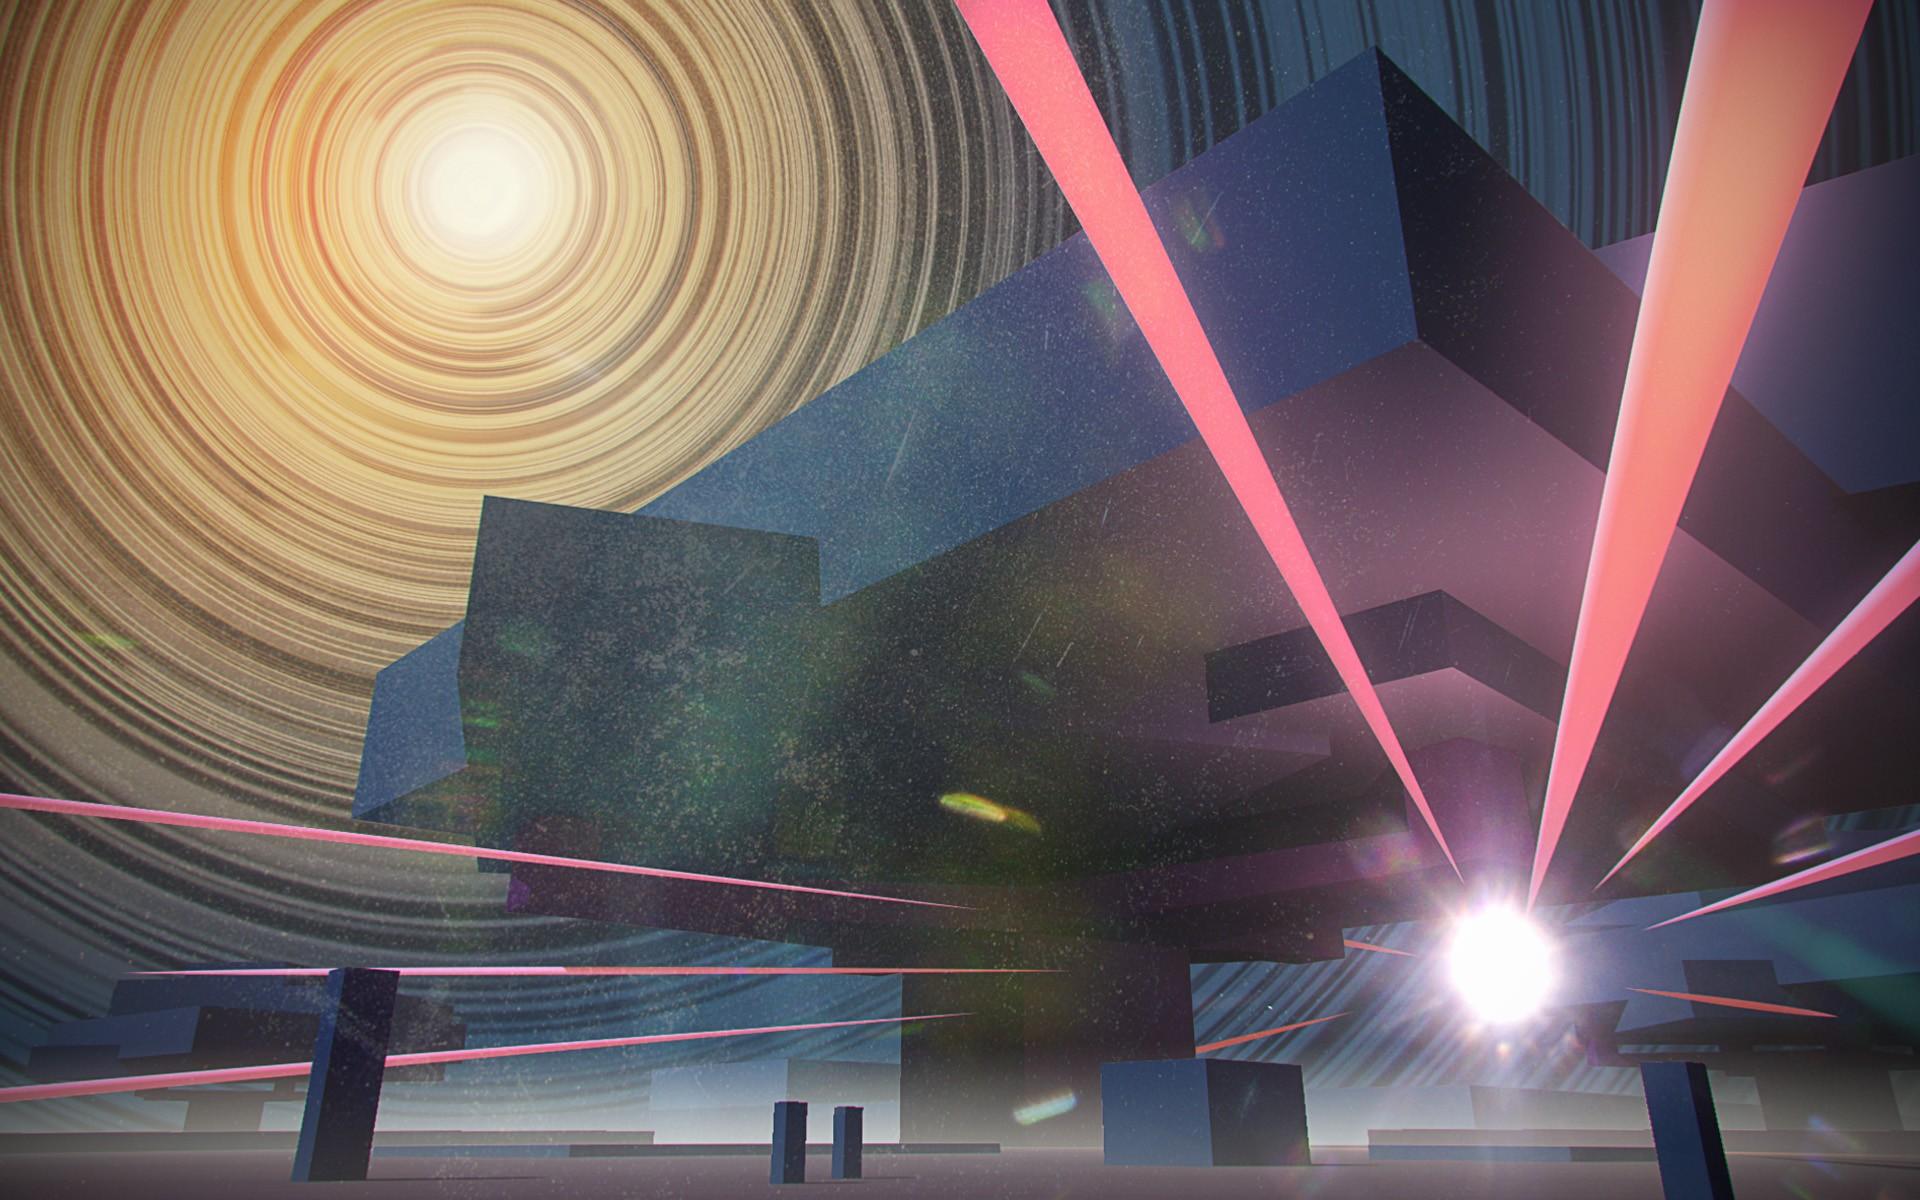 General 1920x1200 CGI futuristic artwork digital art abstract 3D render retro science fiction